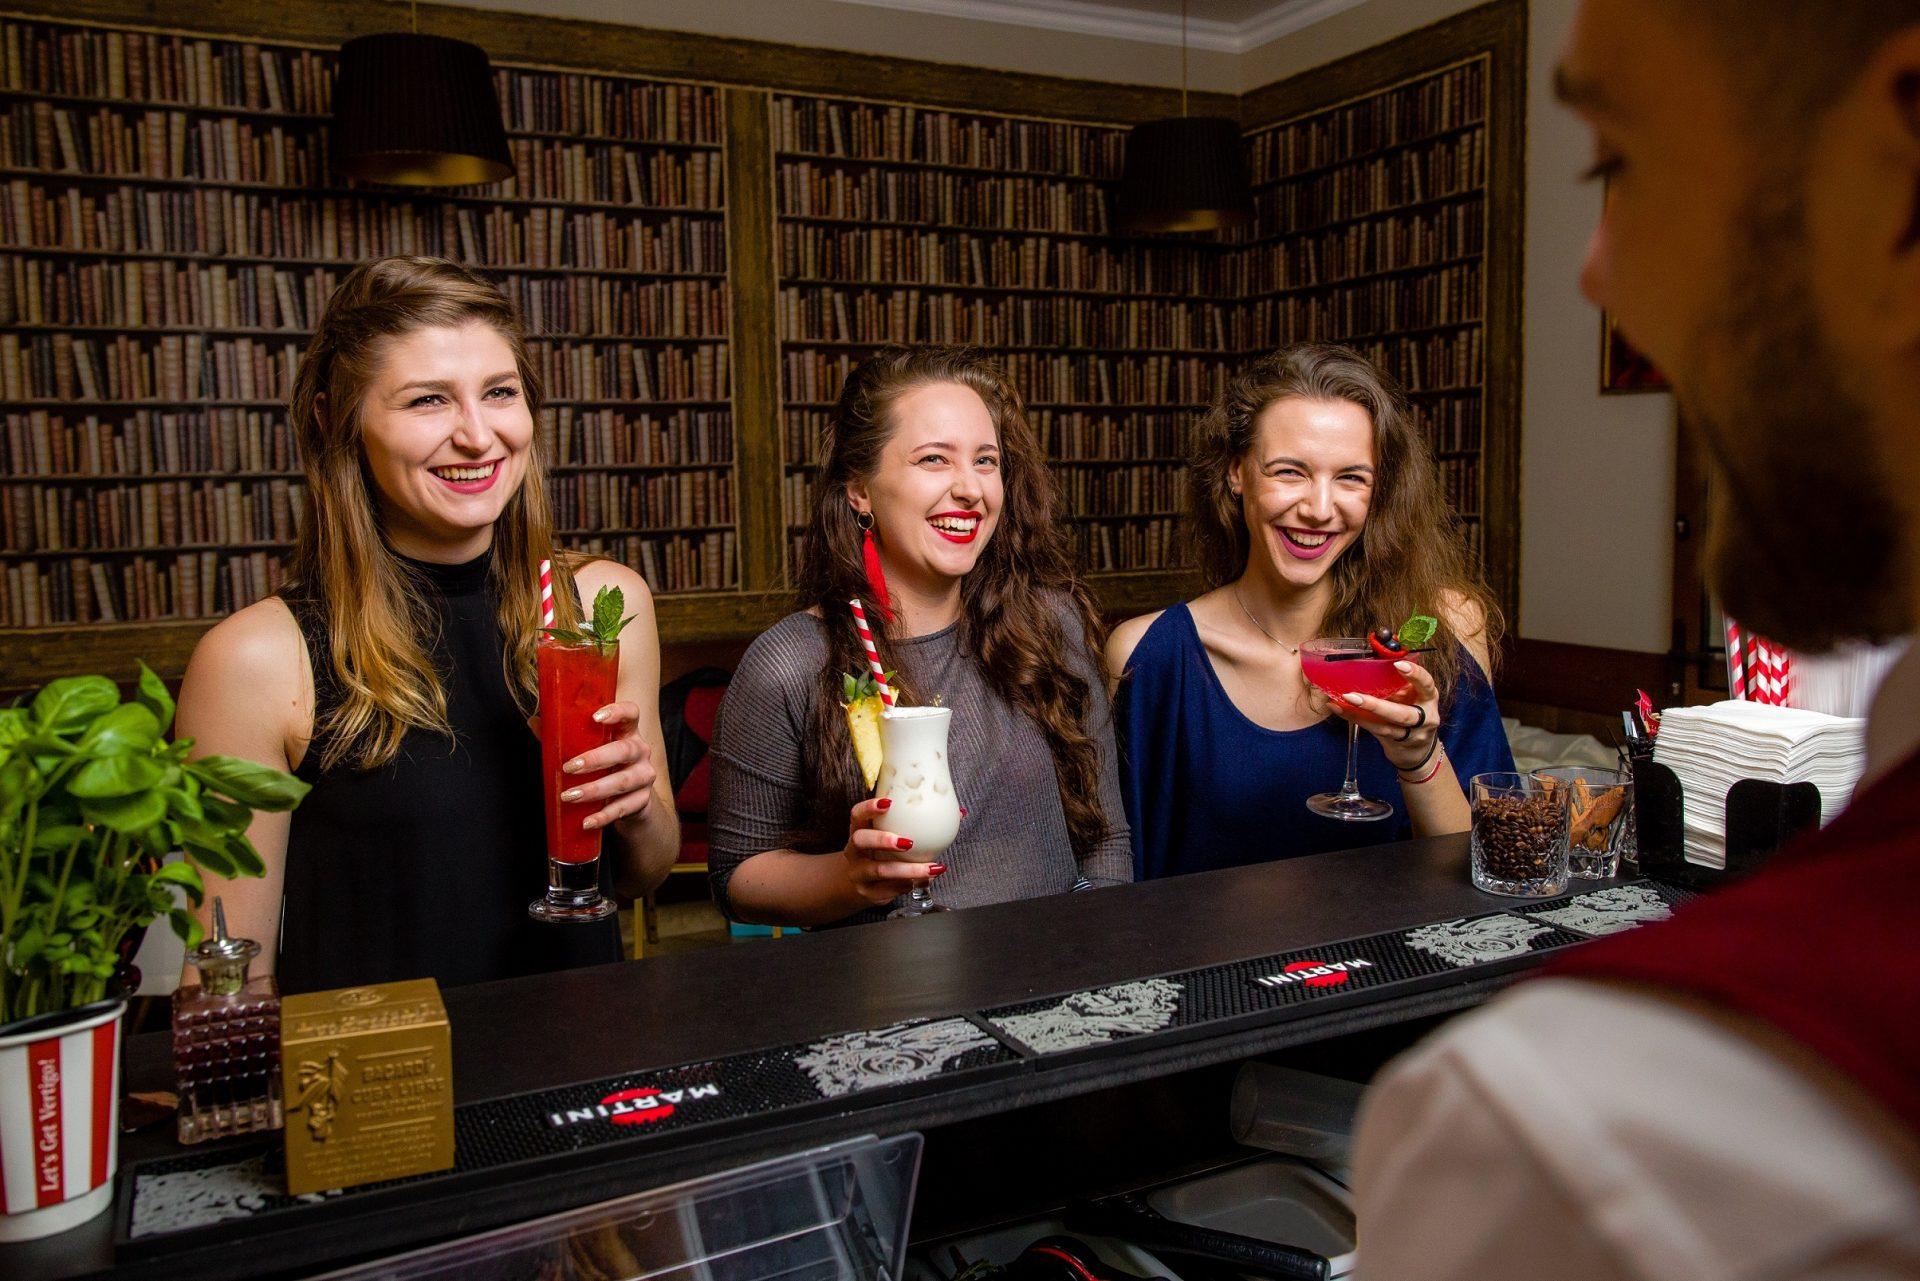 Mobilny Bar Vertigo - goście przy barze